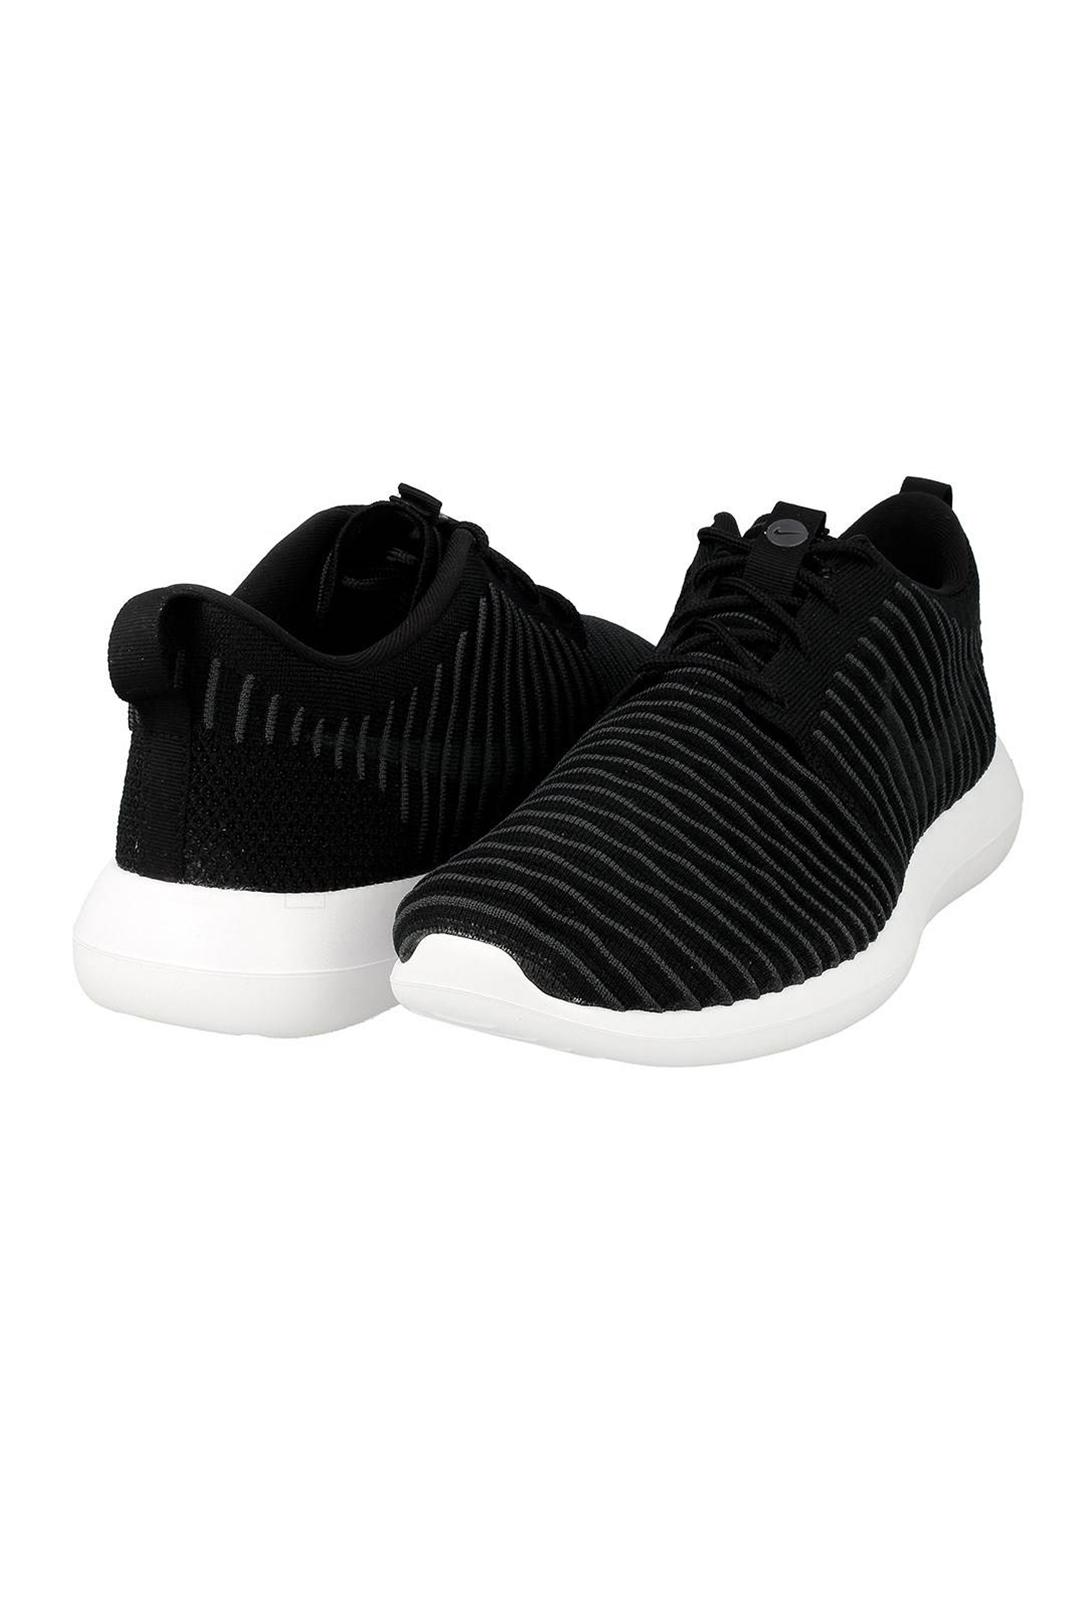 Baskets / Sport  Nike 844833 ROSHE TWO FLYKNIT 001 NOIR/BLANC/VOLT/GRIS